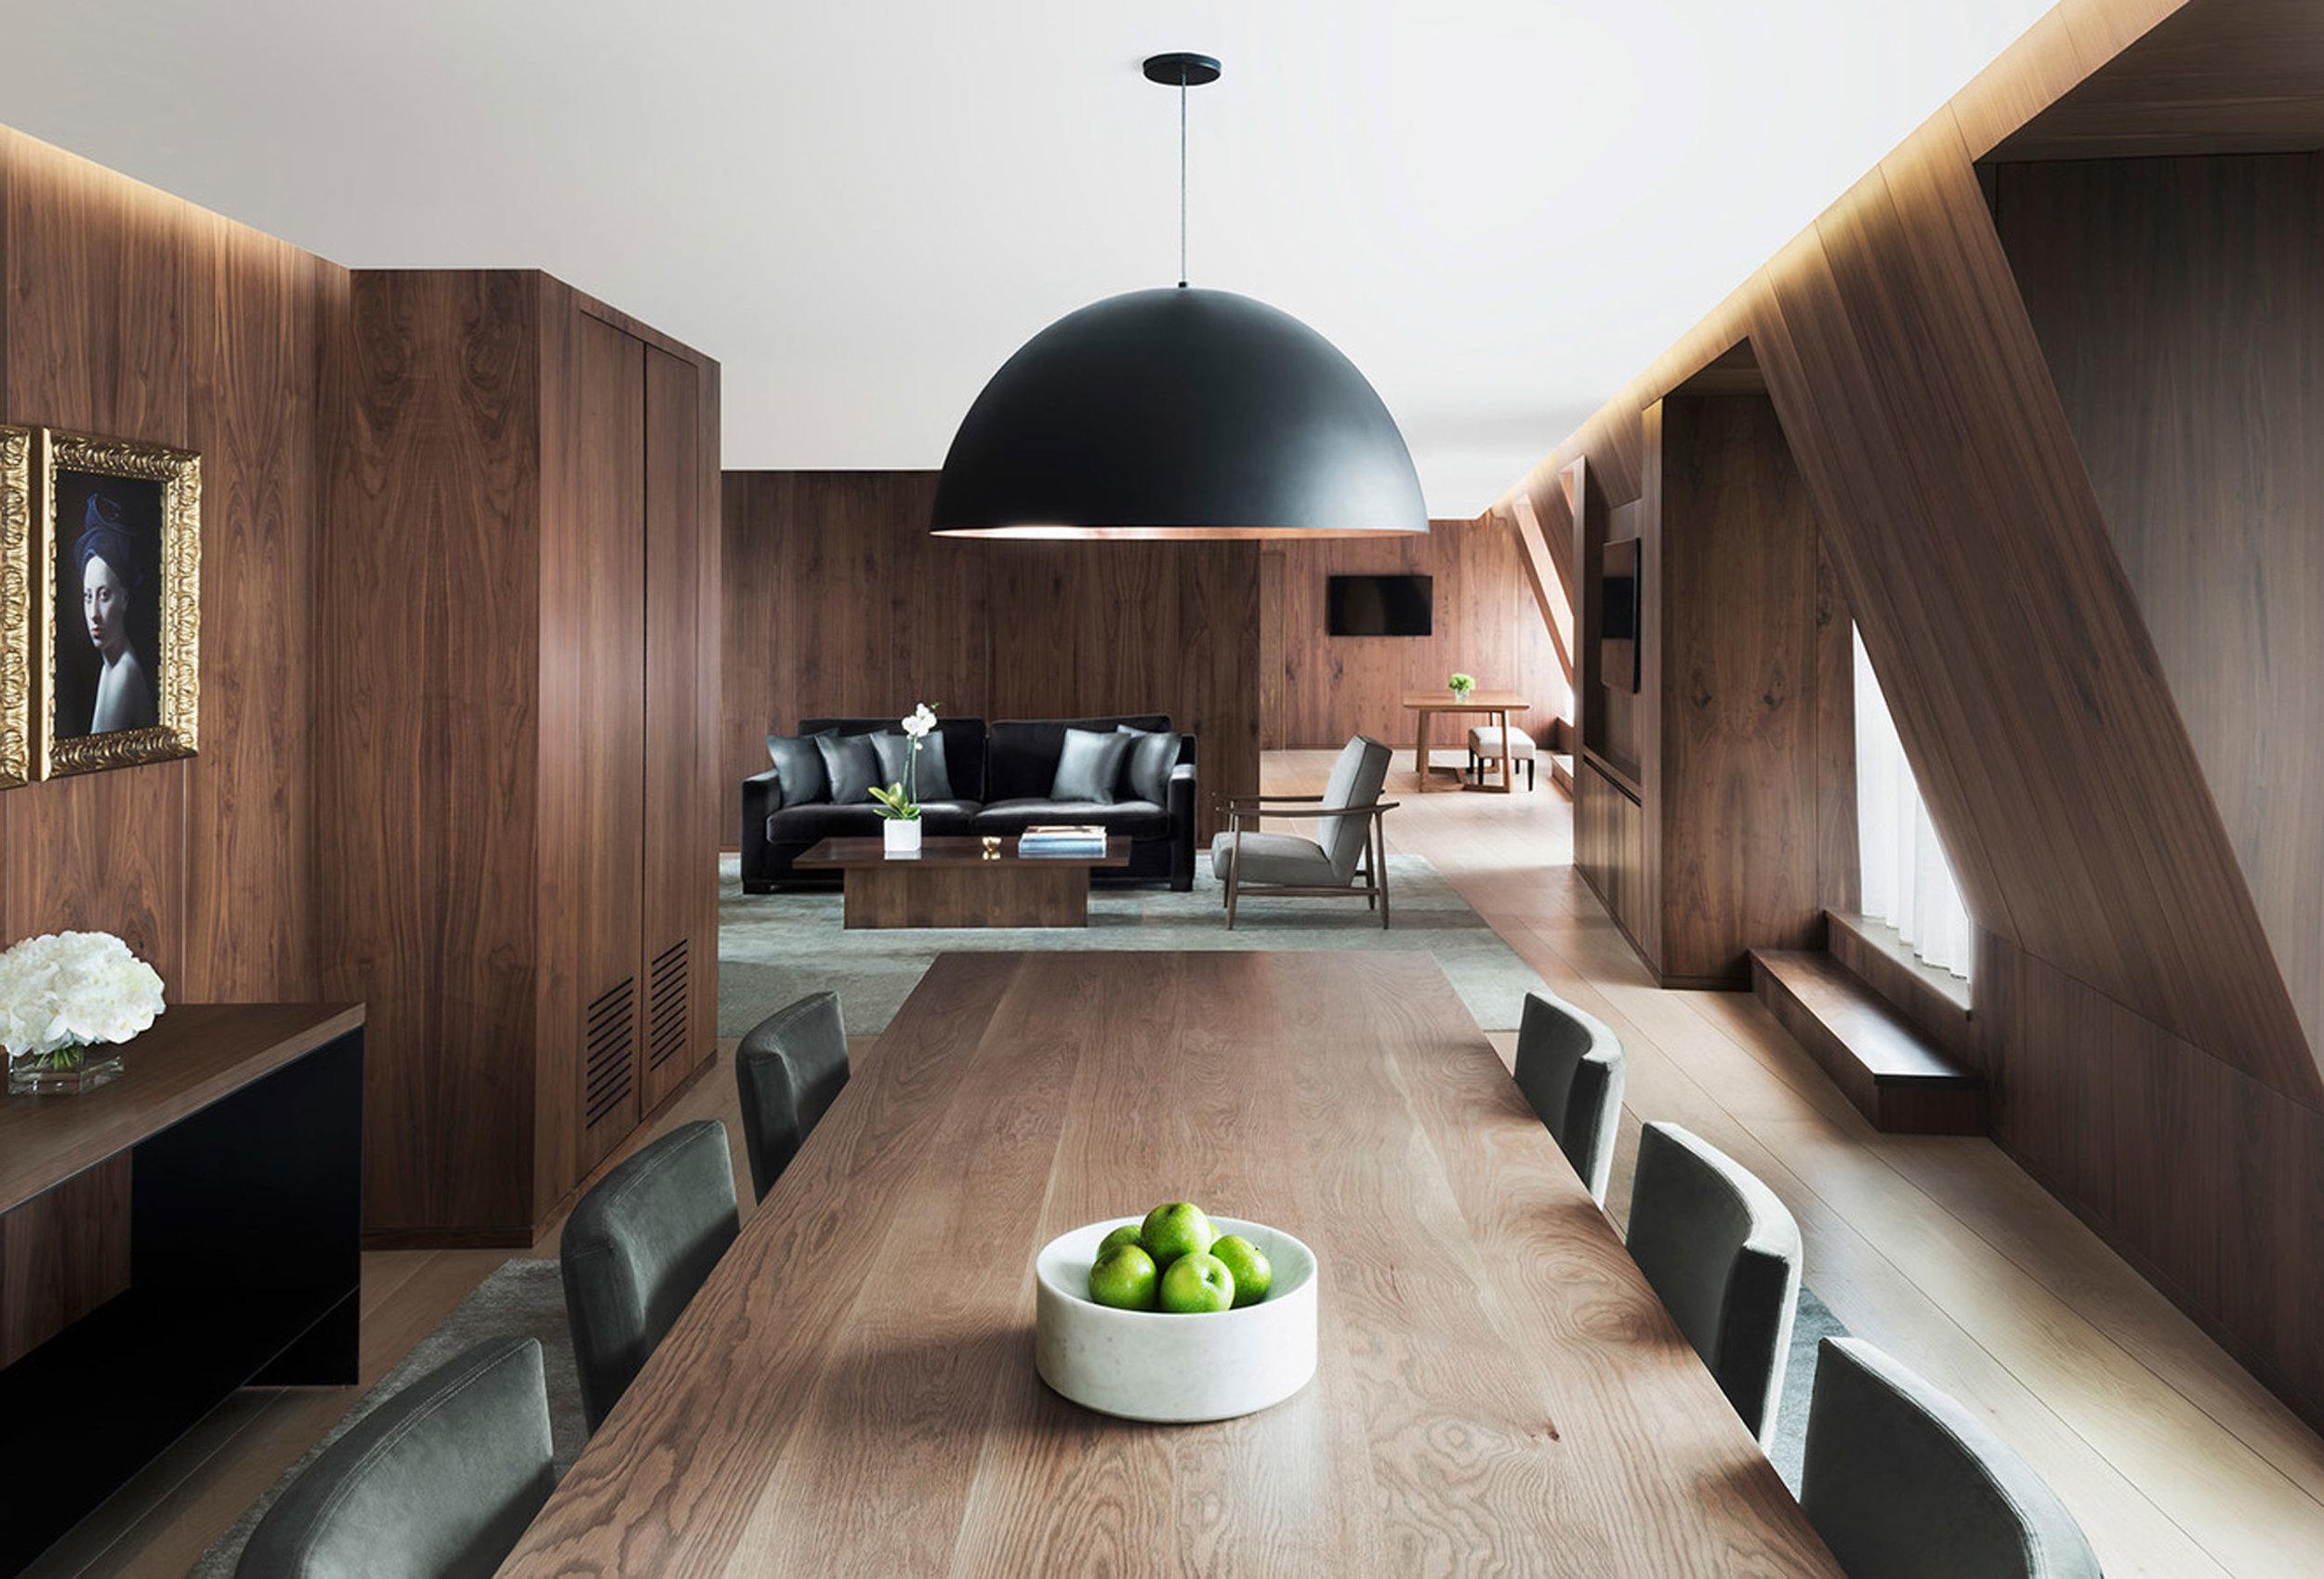 The-London-EDITION-Penthouse-Dining-1870x1400.jpg